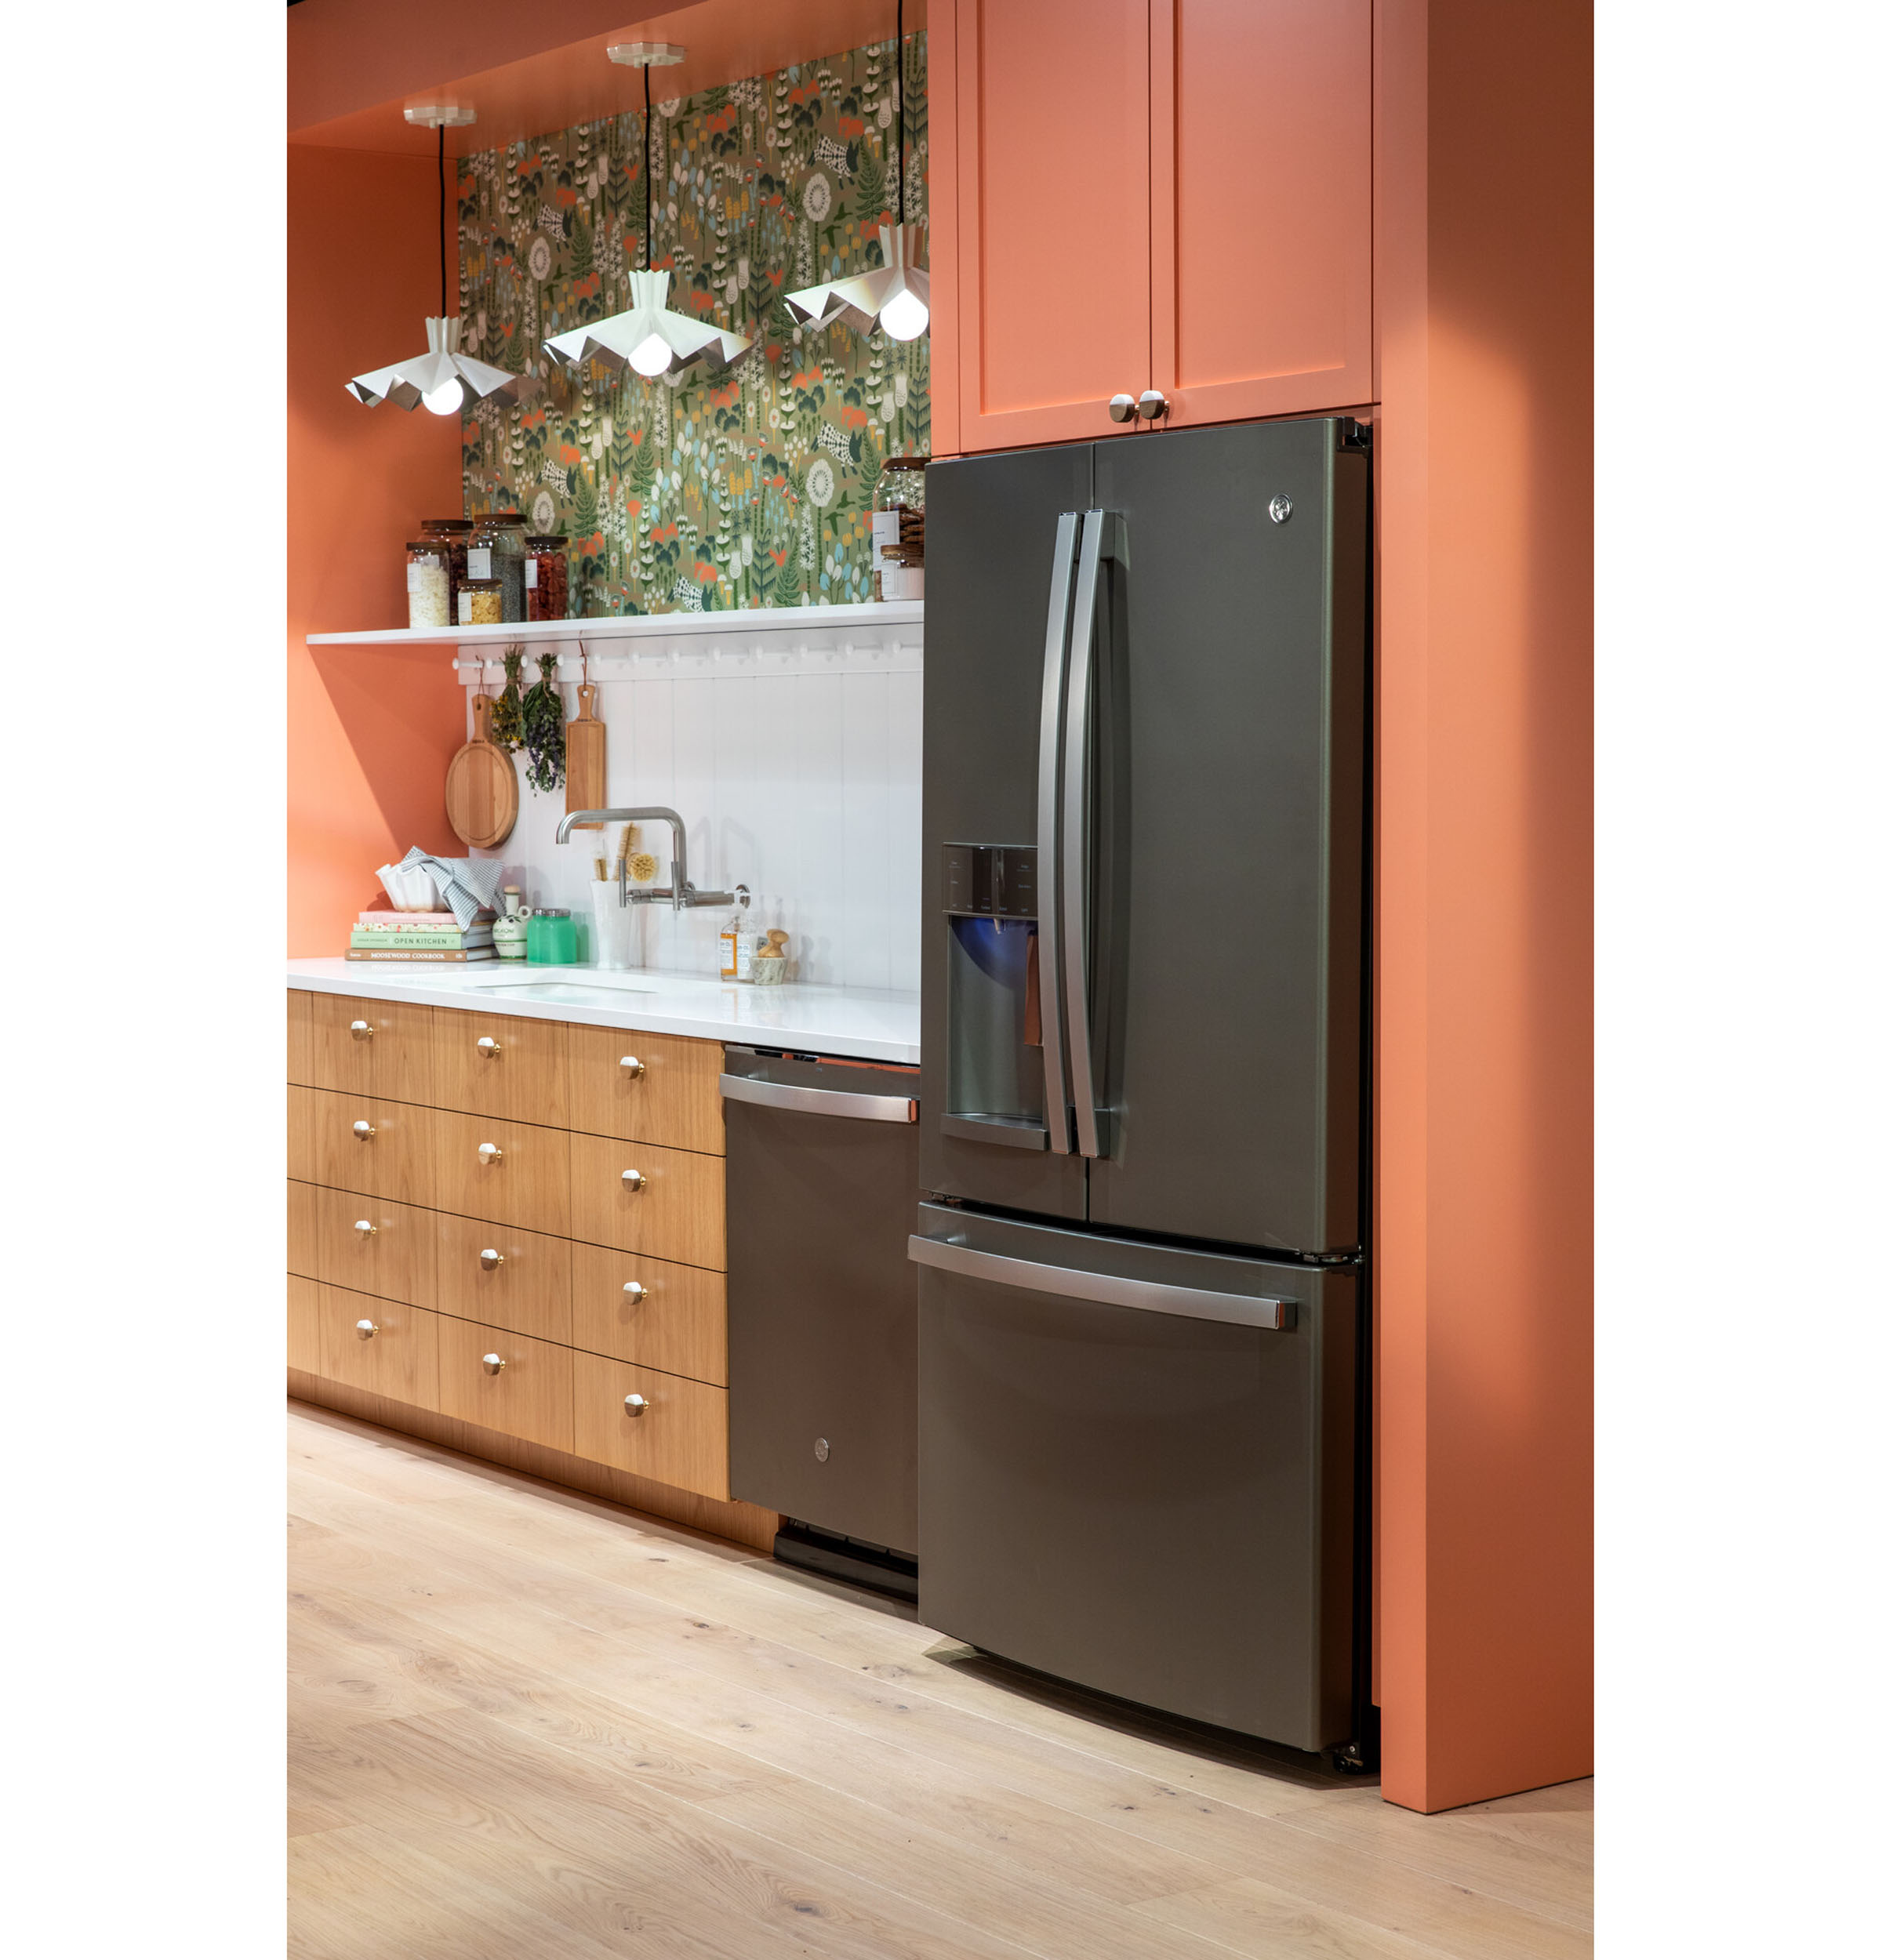 Model: GYE22GMNES | GE GE® ENERGY STAR® 22.1 Cu. Ft. Counter-Depth French-Door Refrigerator